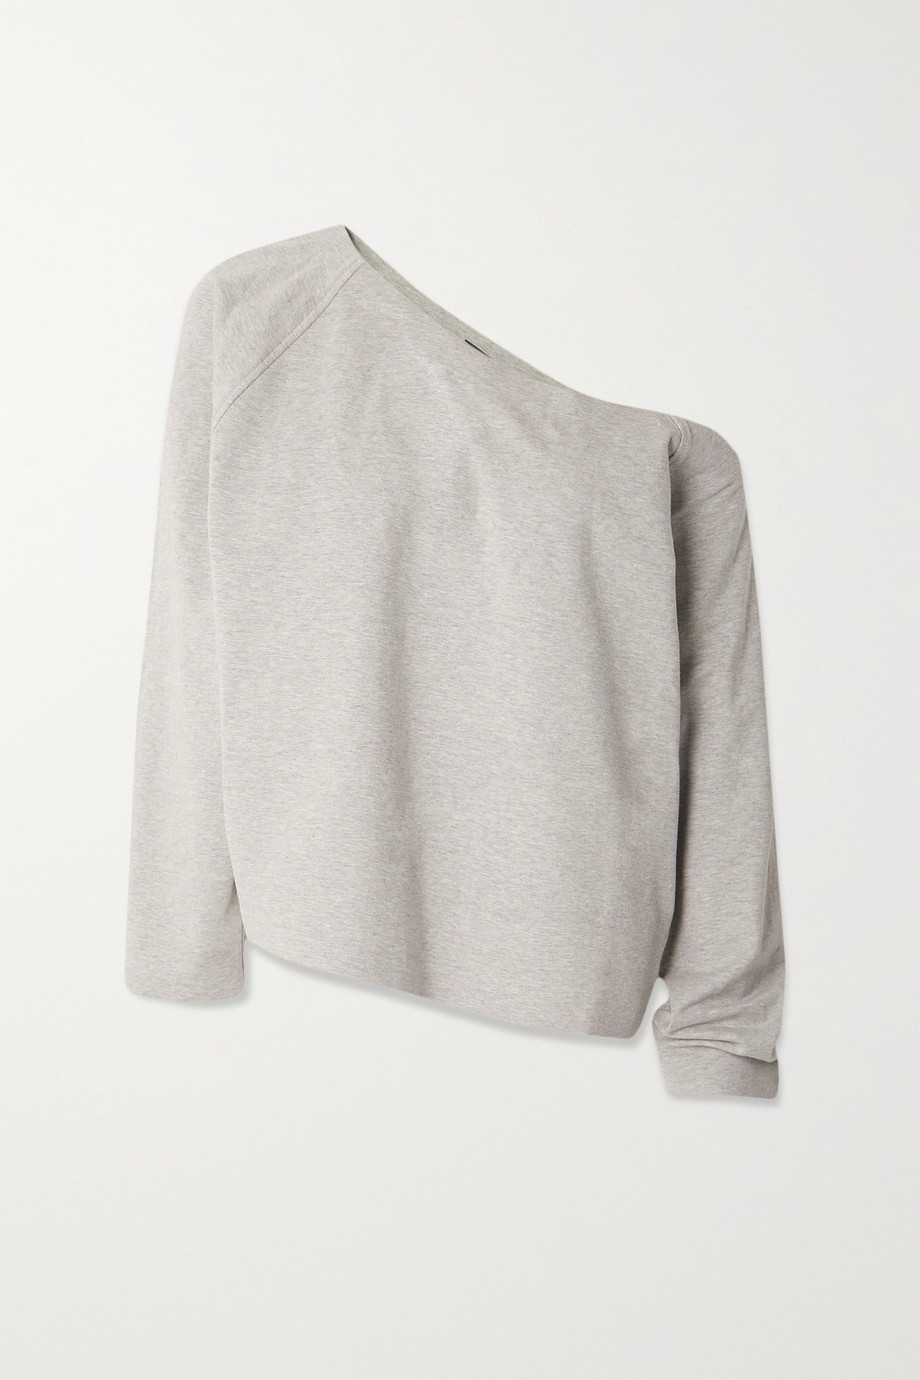 Norma Kamali One-shoulder mélange stretch cotton-jersey sweatshirt